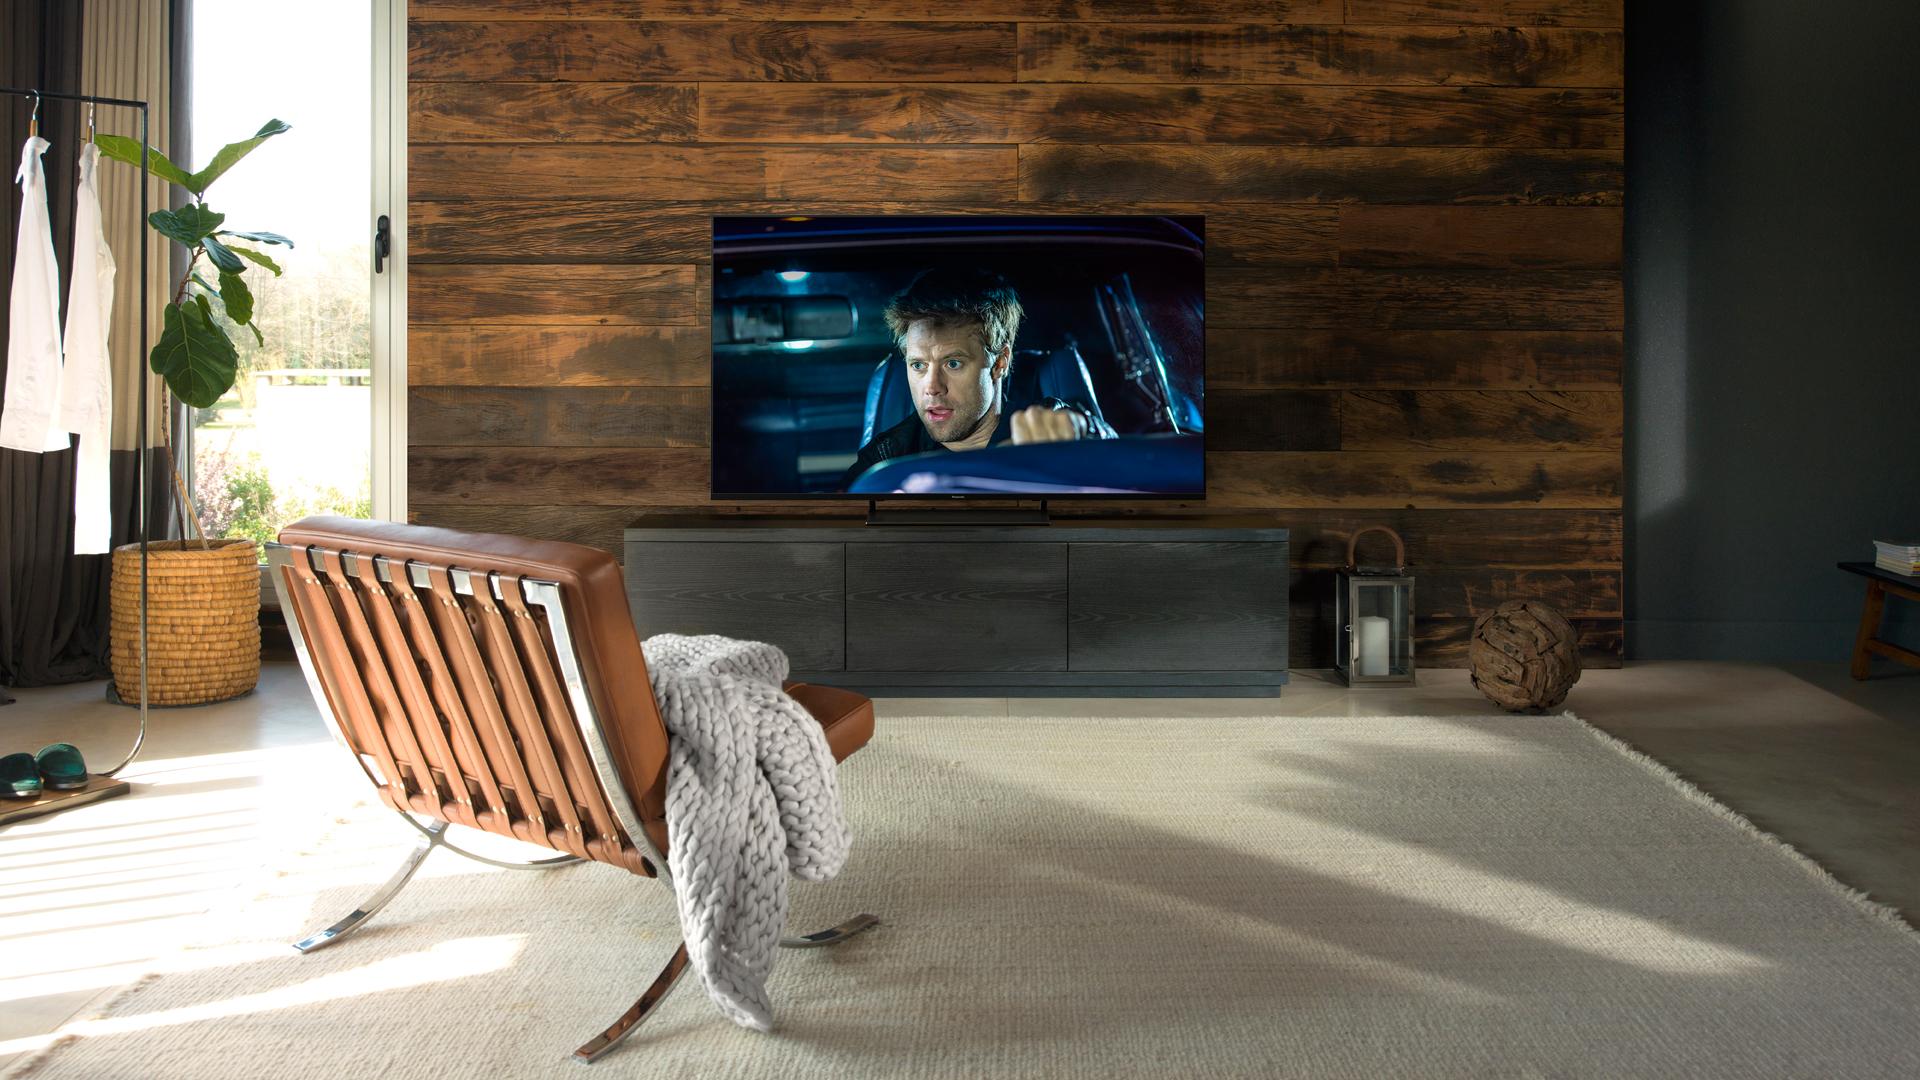 Panasonic GX800 LED TV review | TechRadar